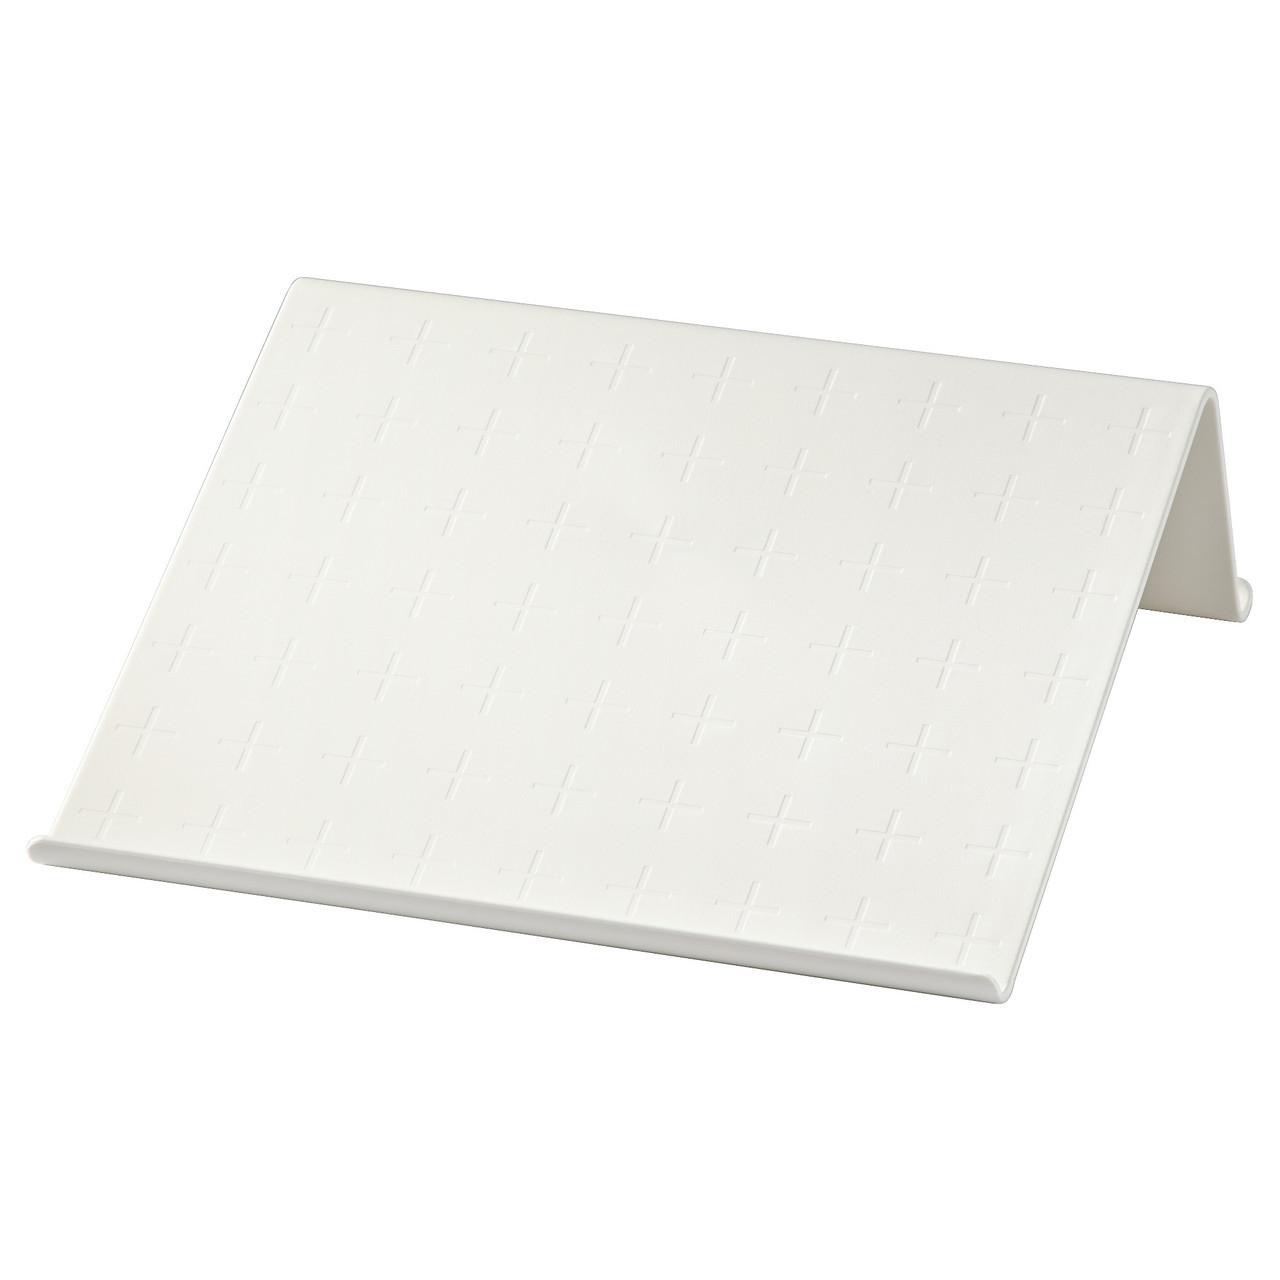 Подставка для планшета ISBERGET, белый, IKEA, 203.025.96